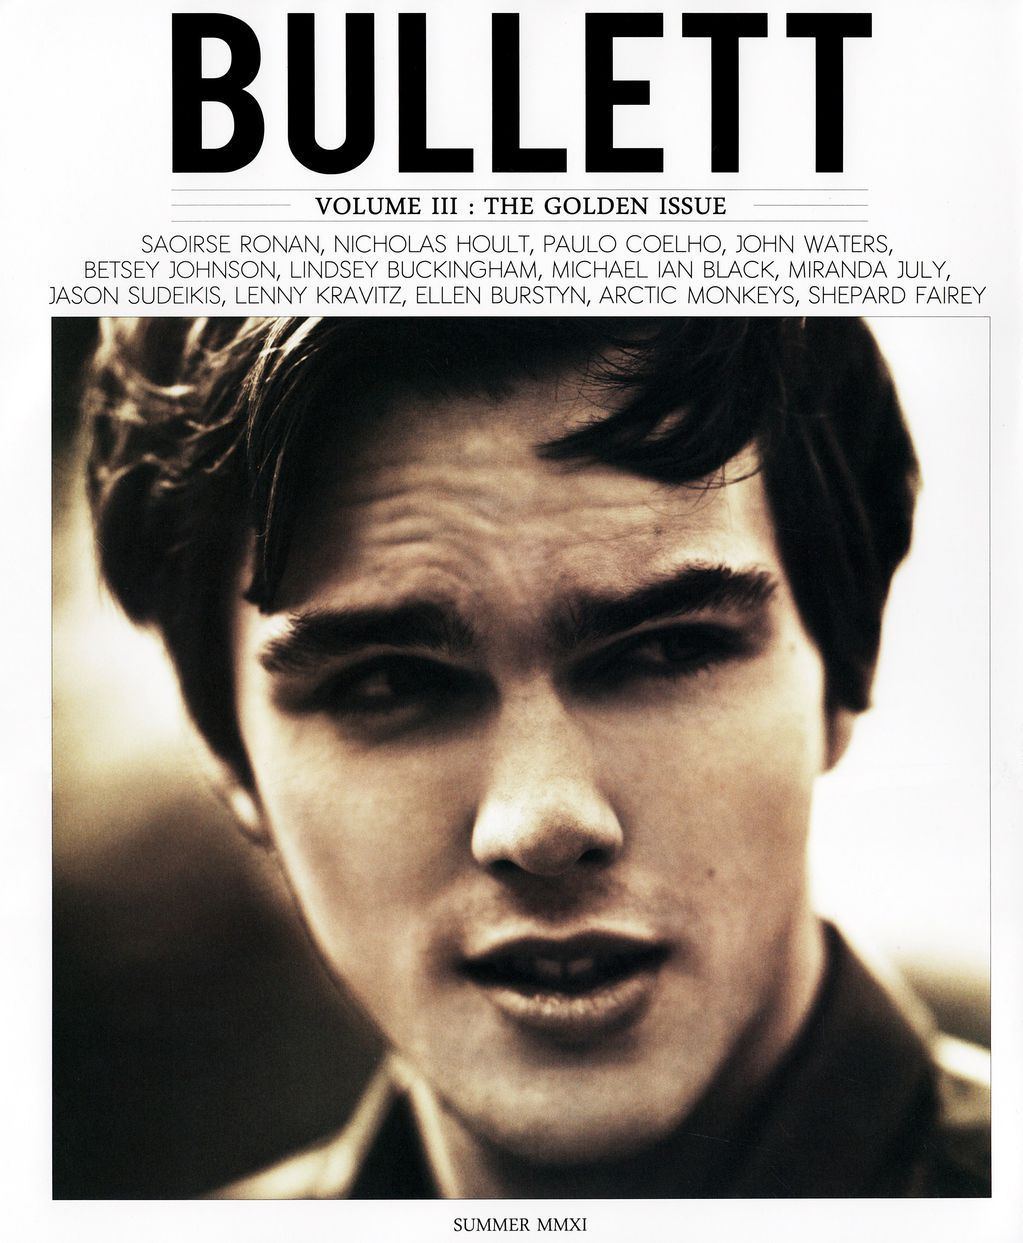 Nicholas Hoult for Bullett